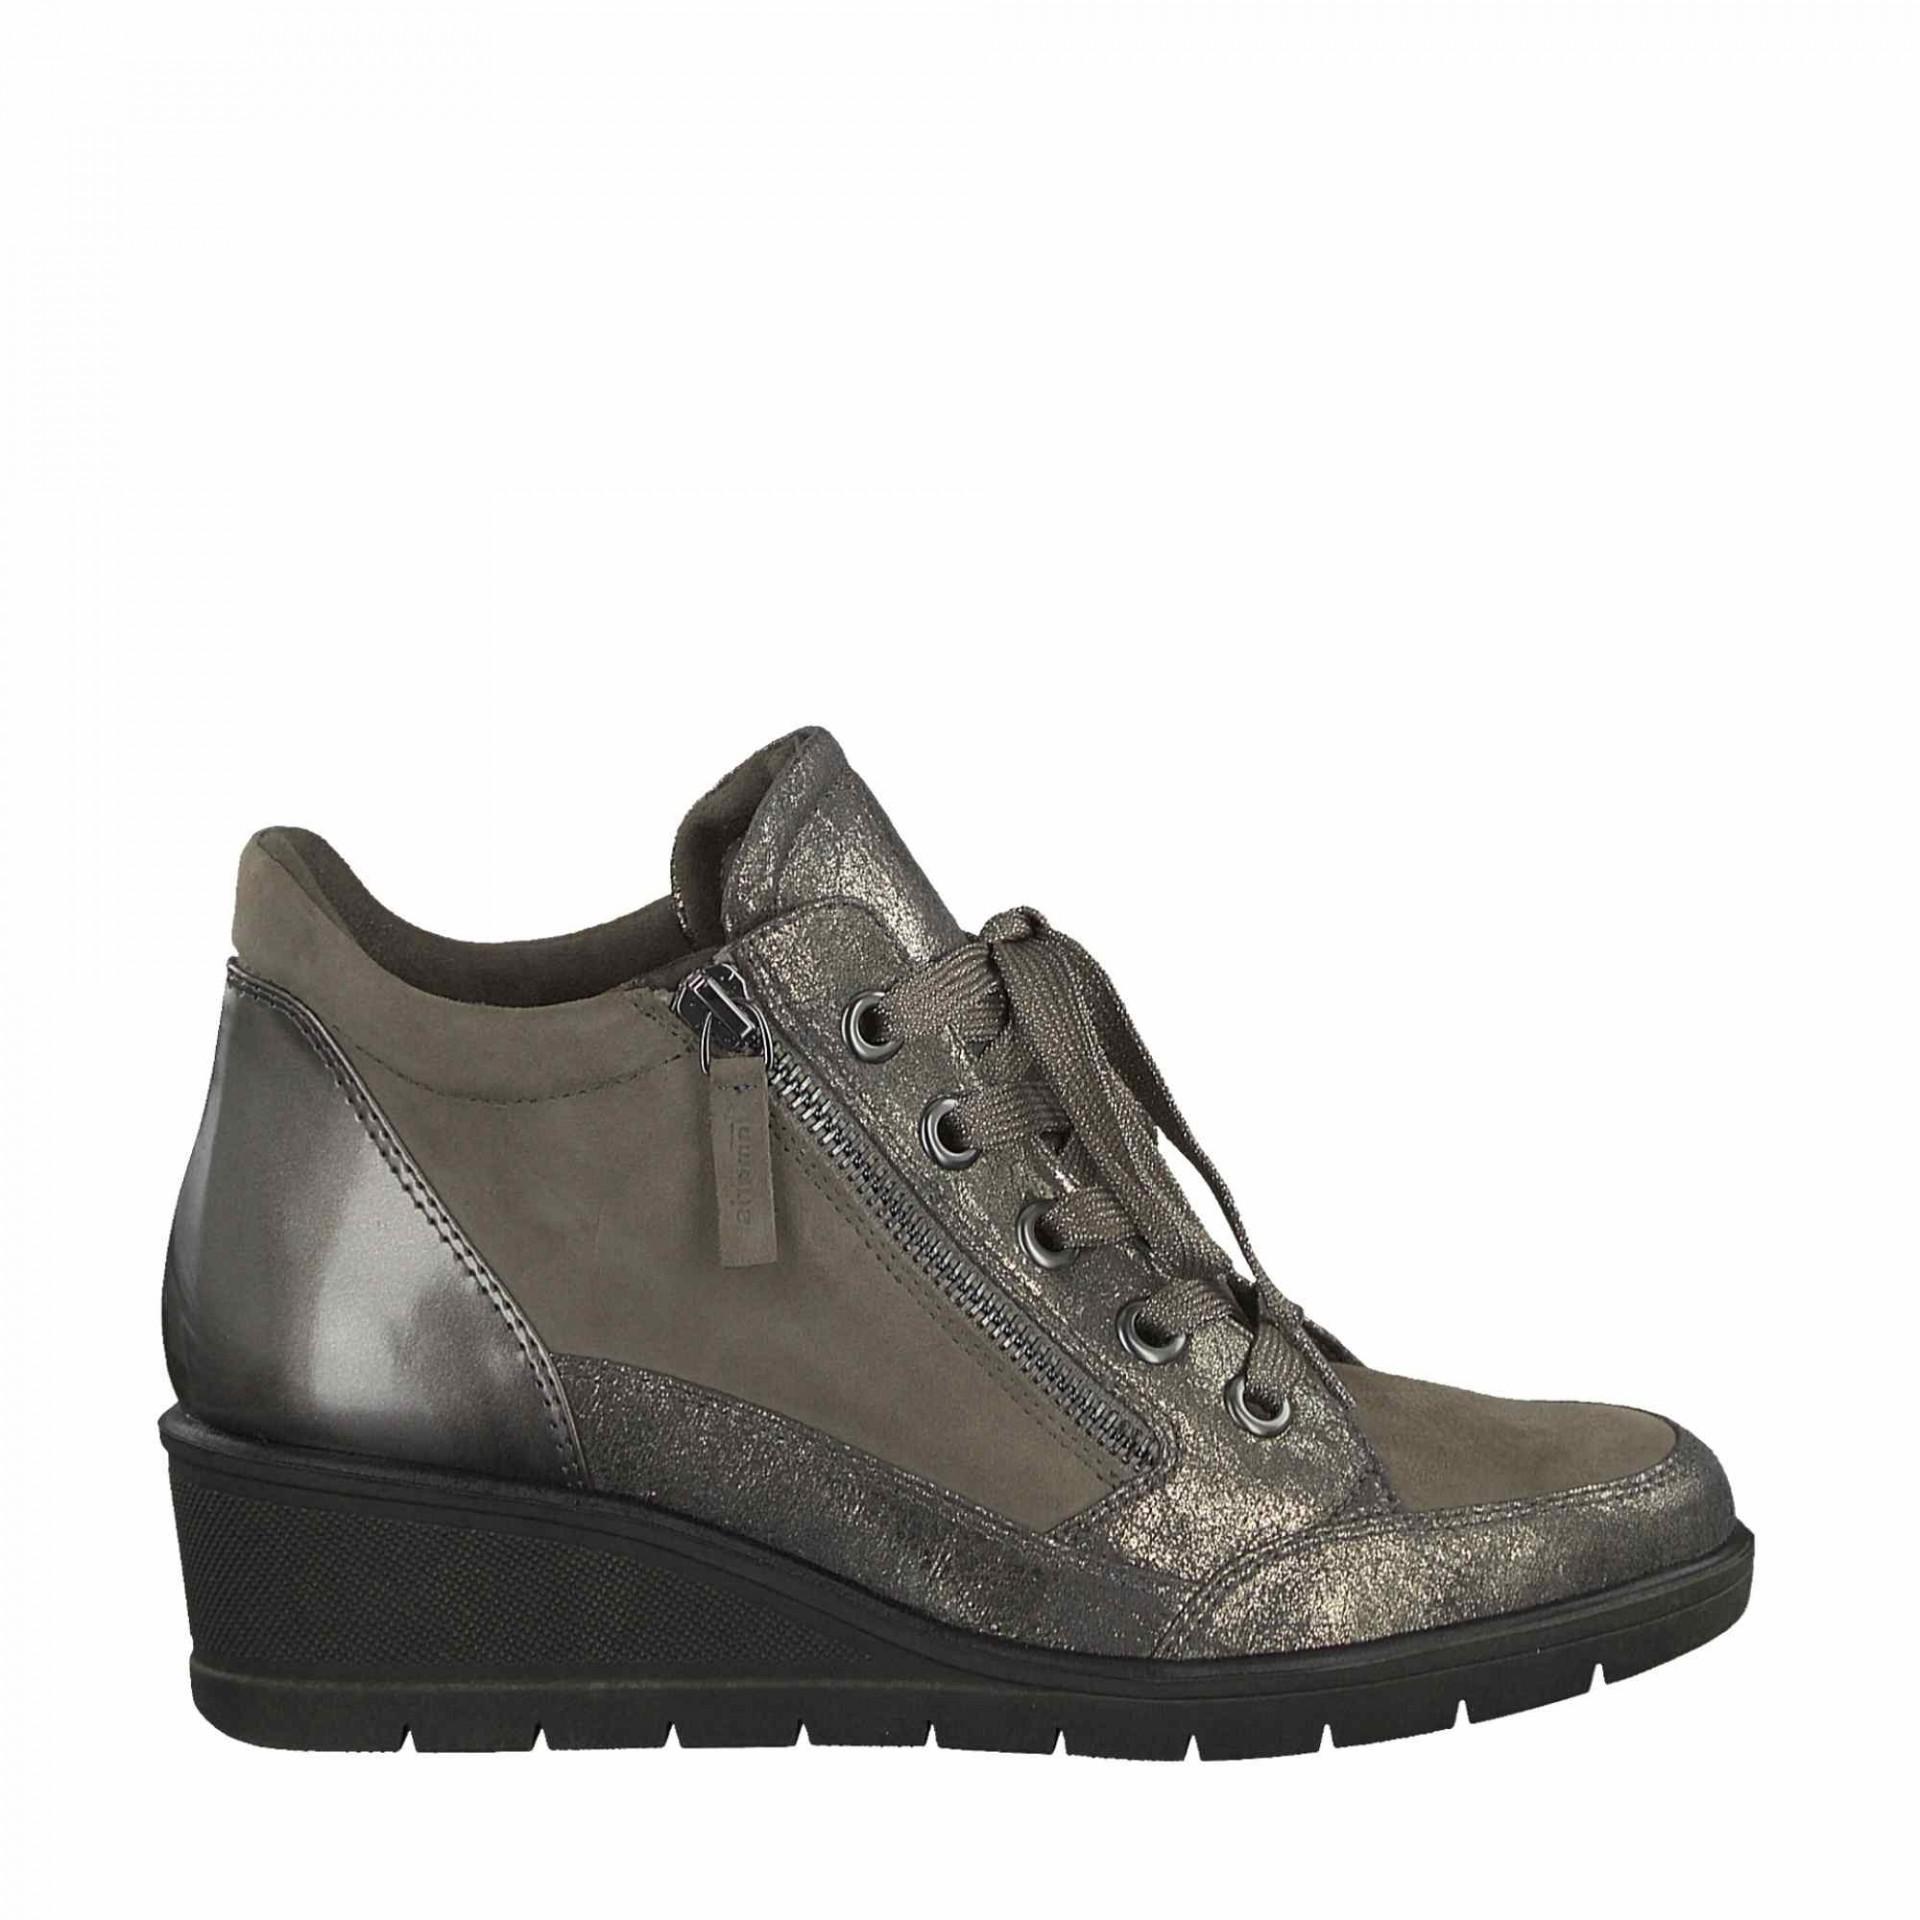 866d96cfde239 TAMARIS 1-25233-29 805 sneakersky | SecretShoes.sk